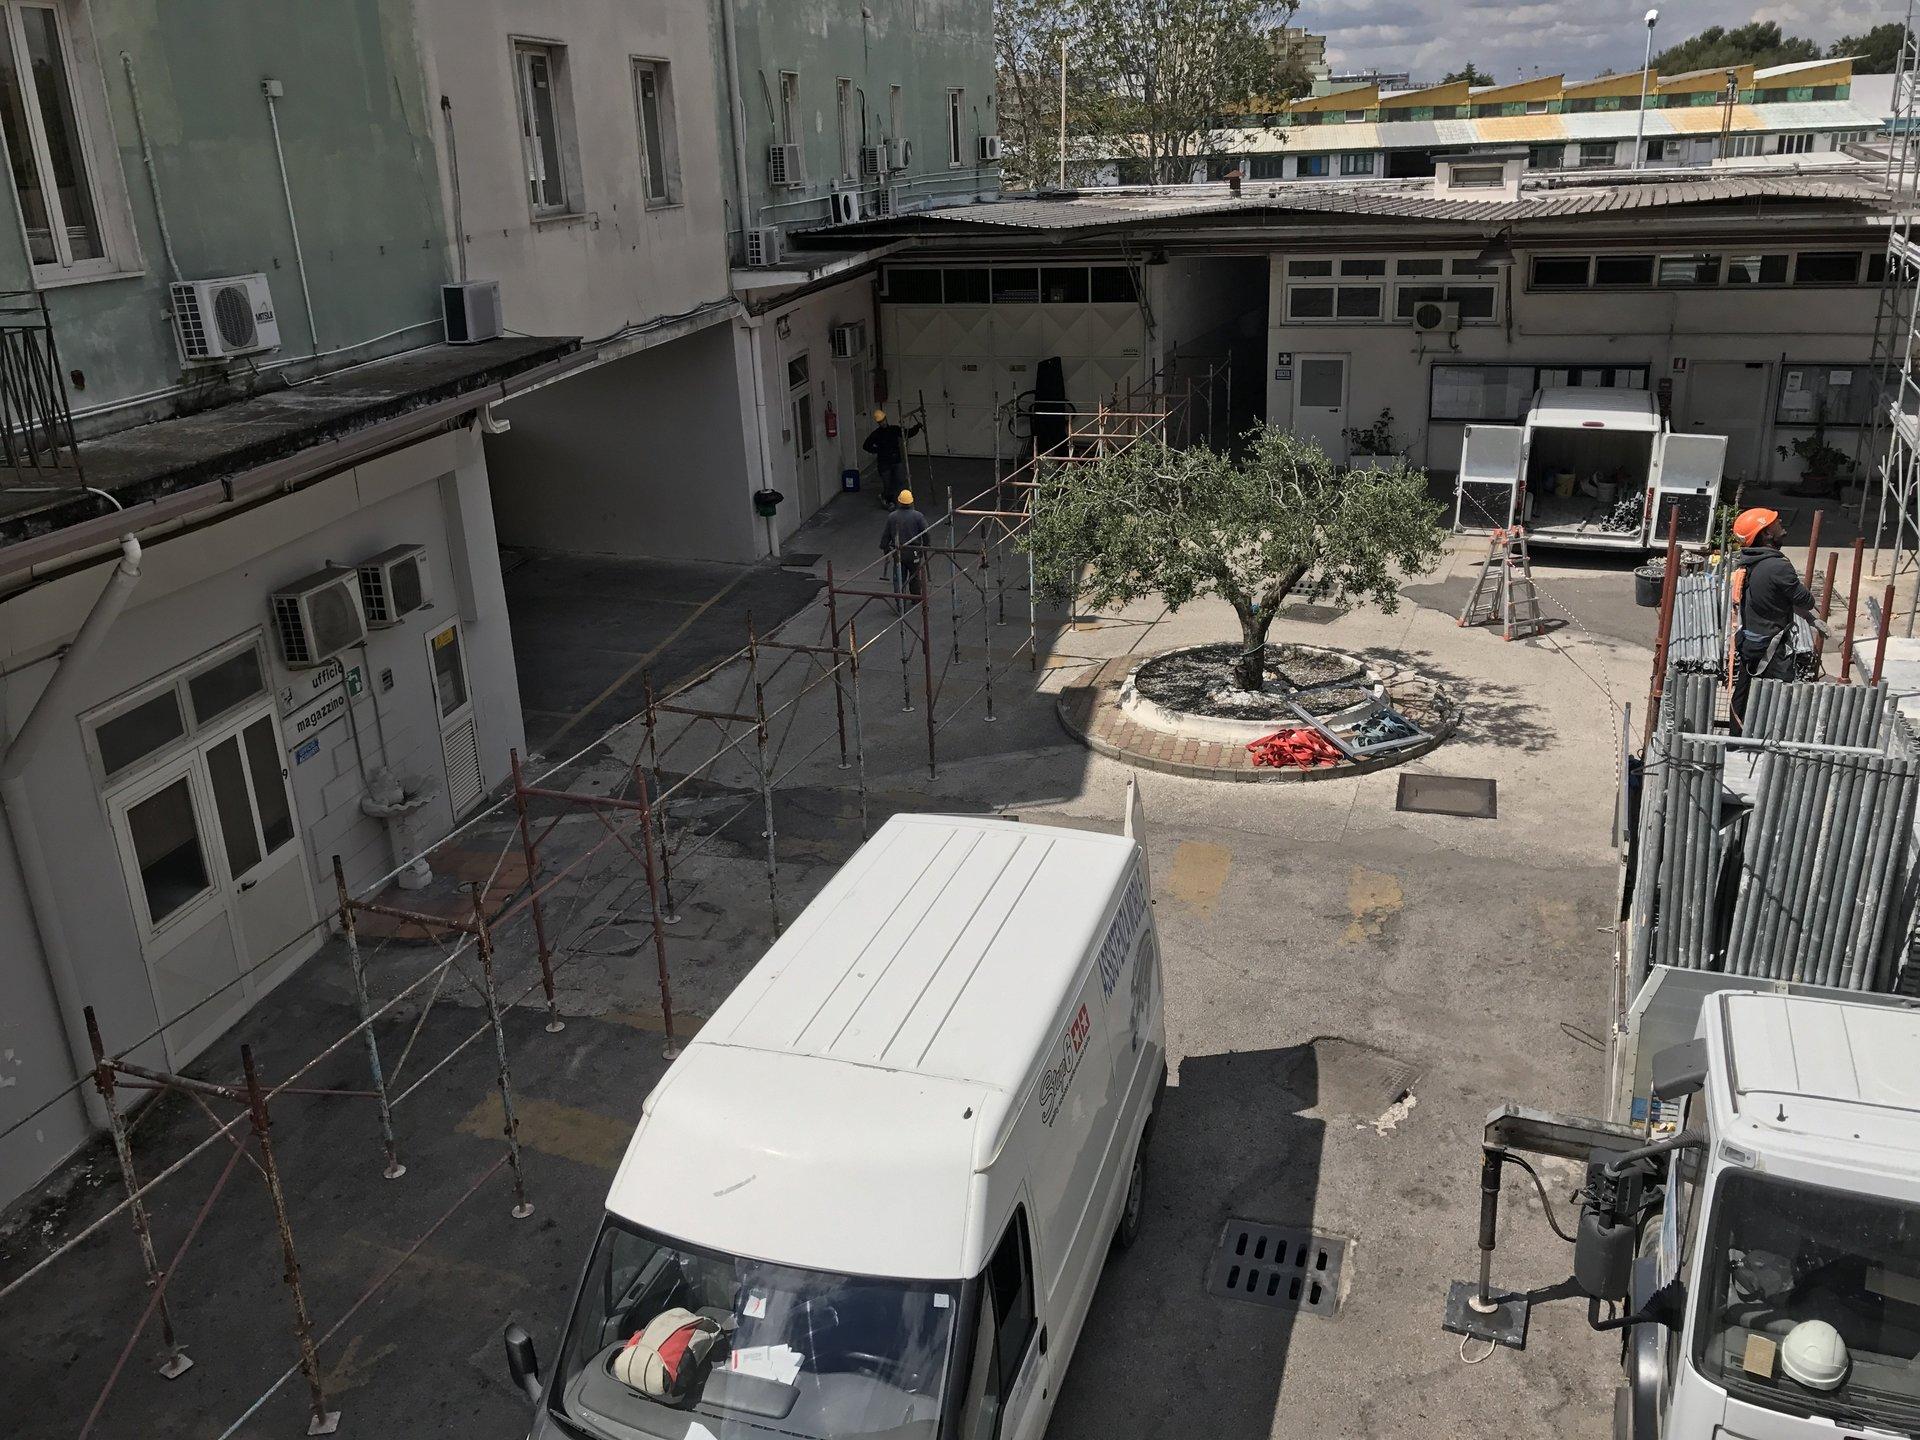 camion per lavori edili